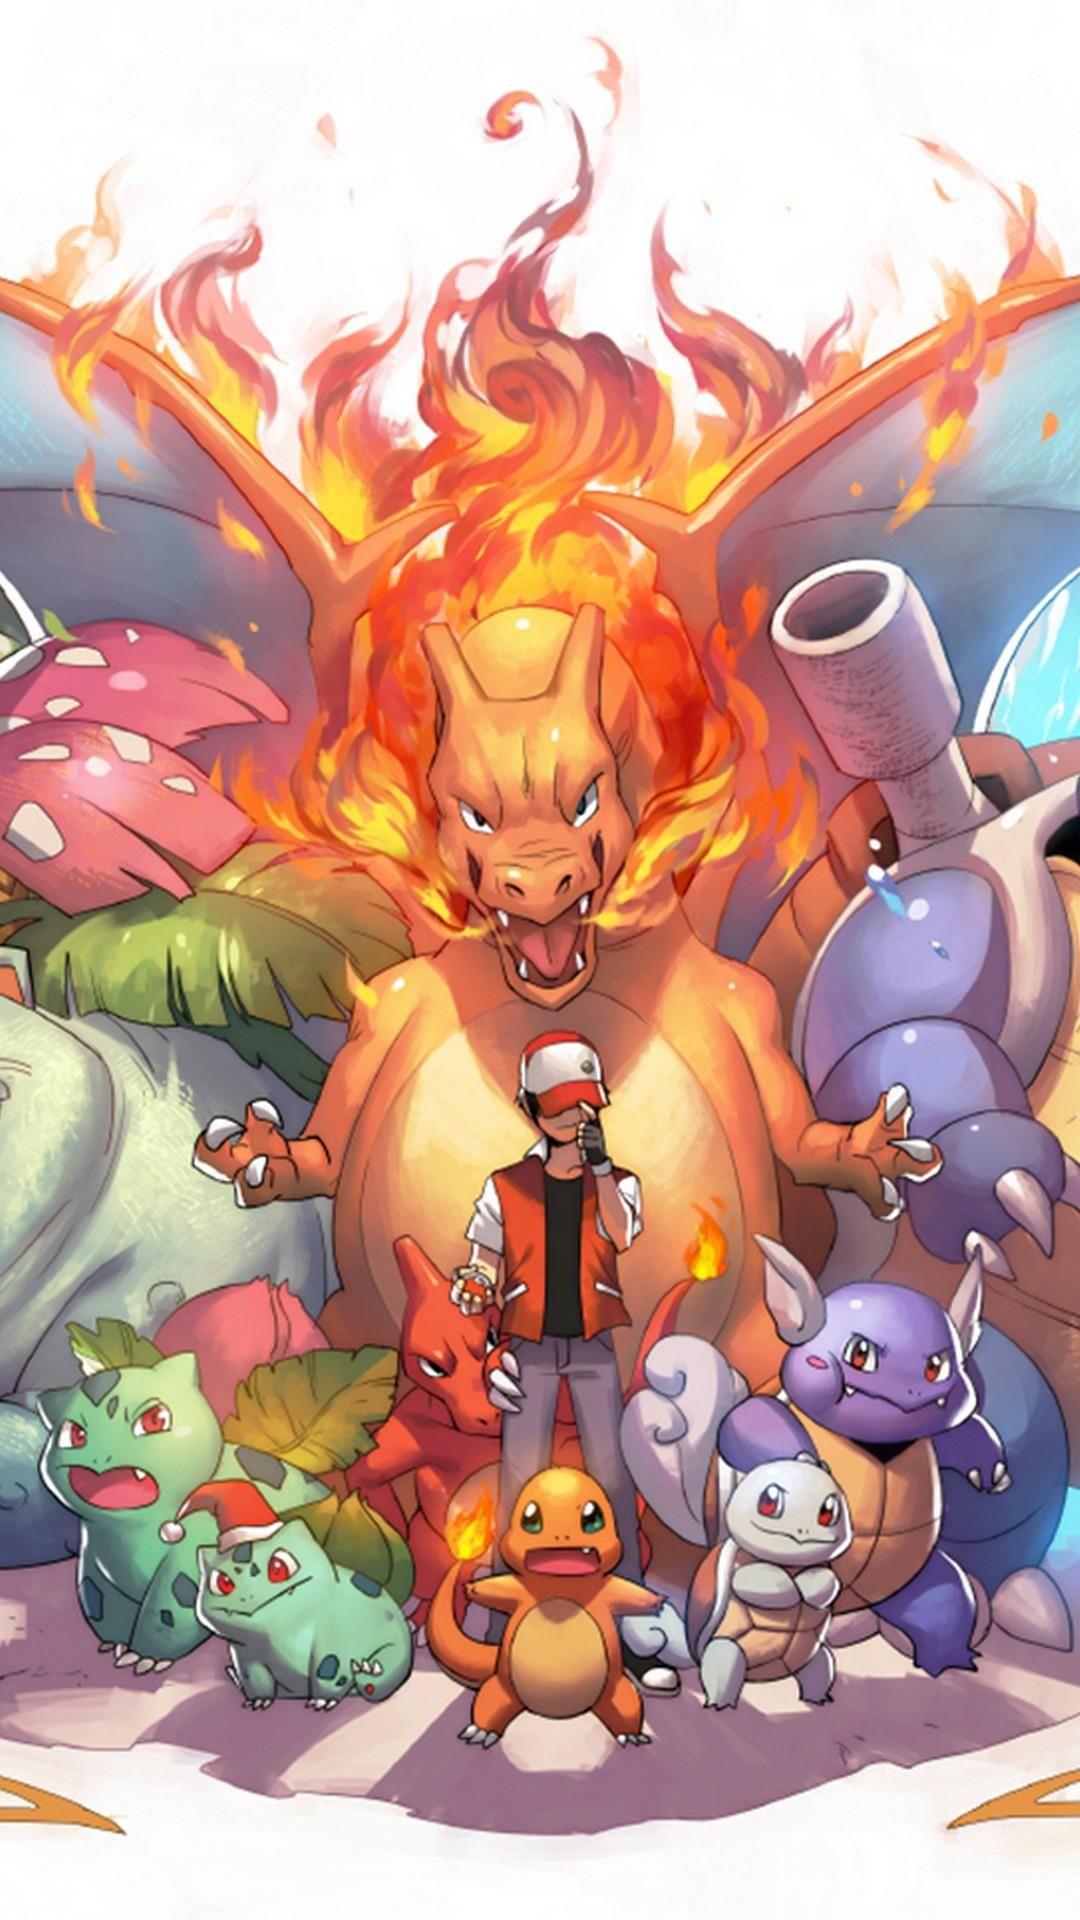 Legendary Pokemon Image Pokemon Android Wallpaper Cool Anime Wallpapers Cool Pokemon Wallpapers